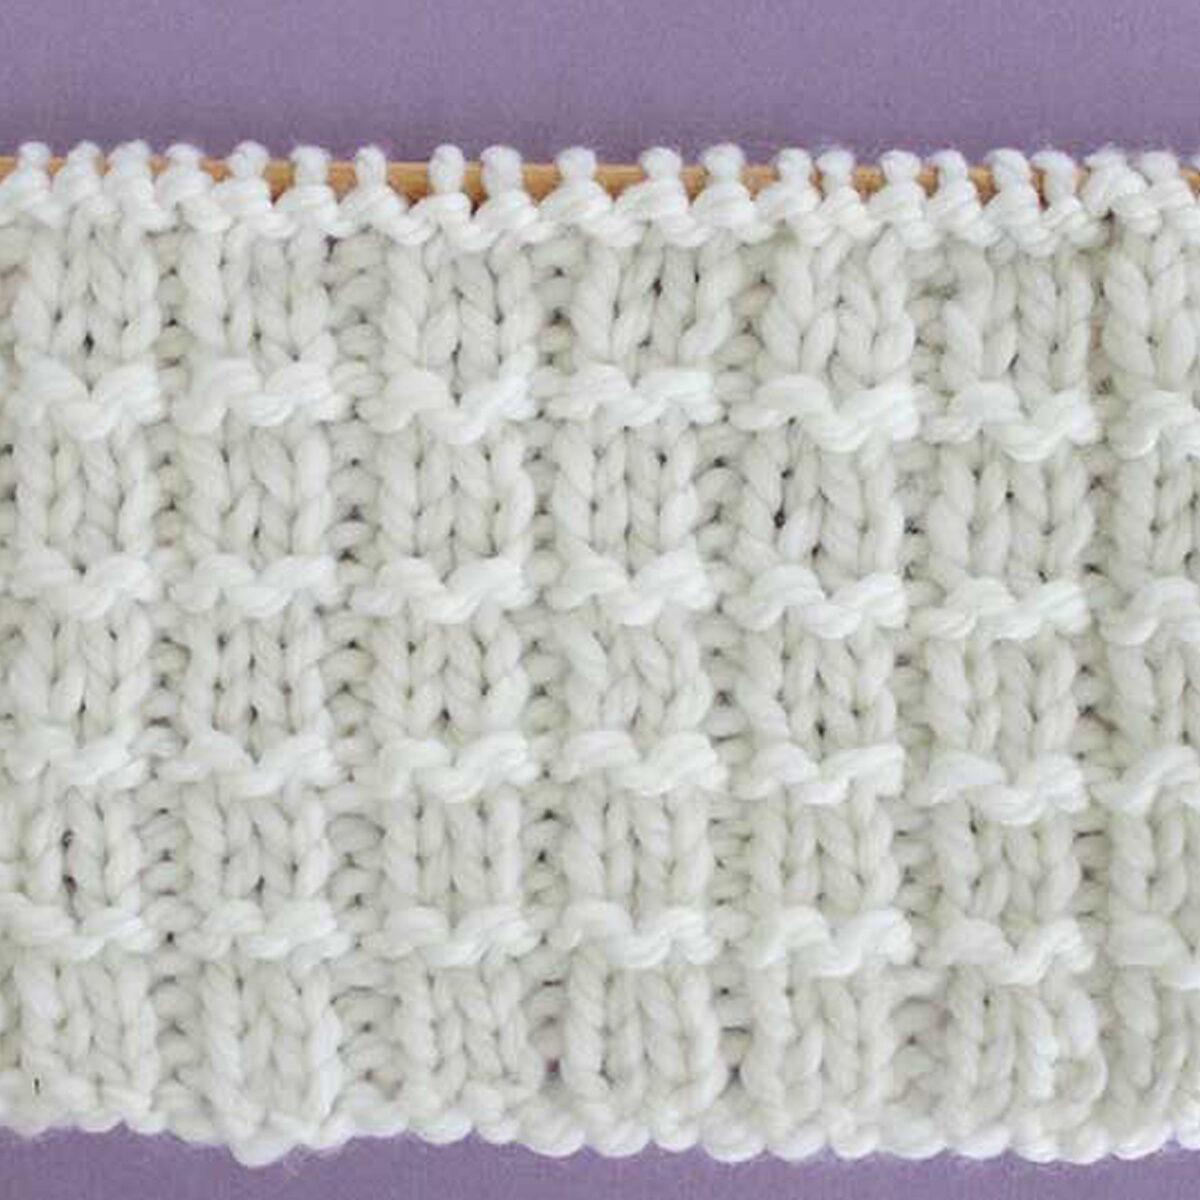 Pique Rib Knit Stitch Pattern in white yarn on knitting needle.